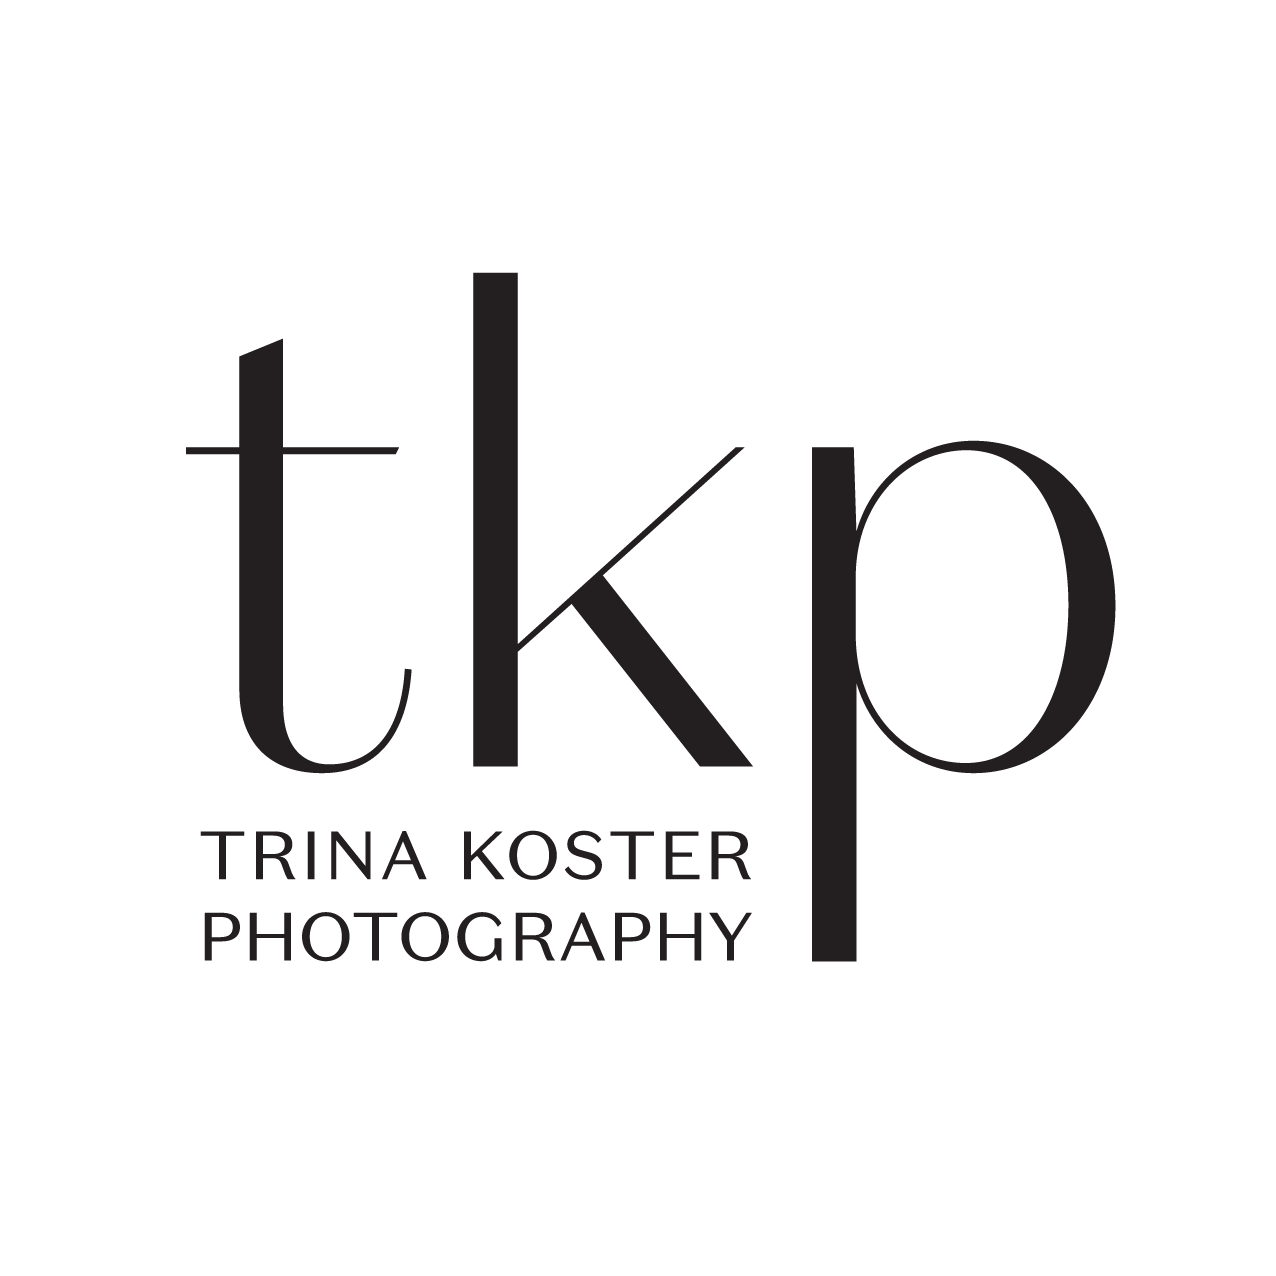 Trina Koster Photography